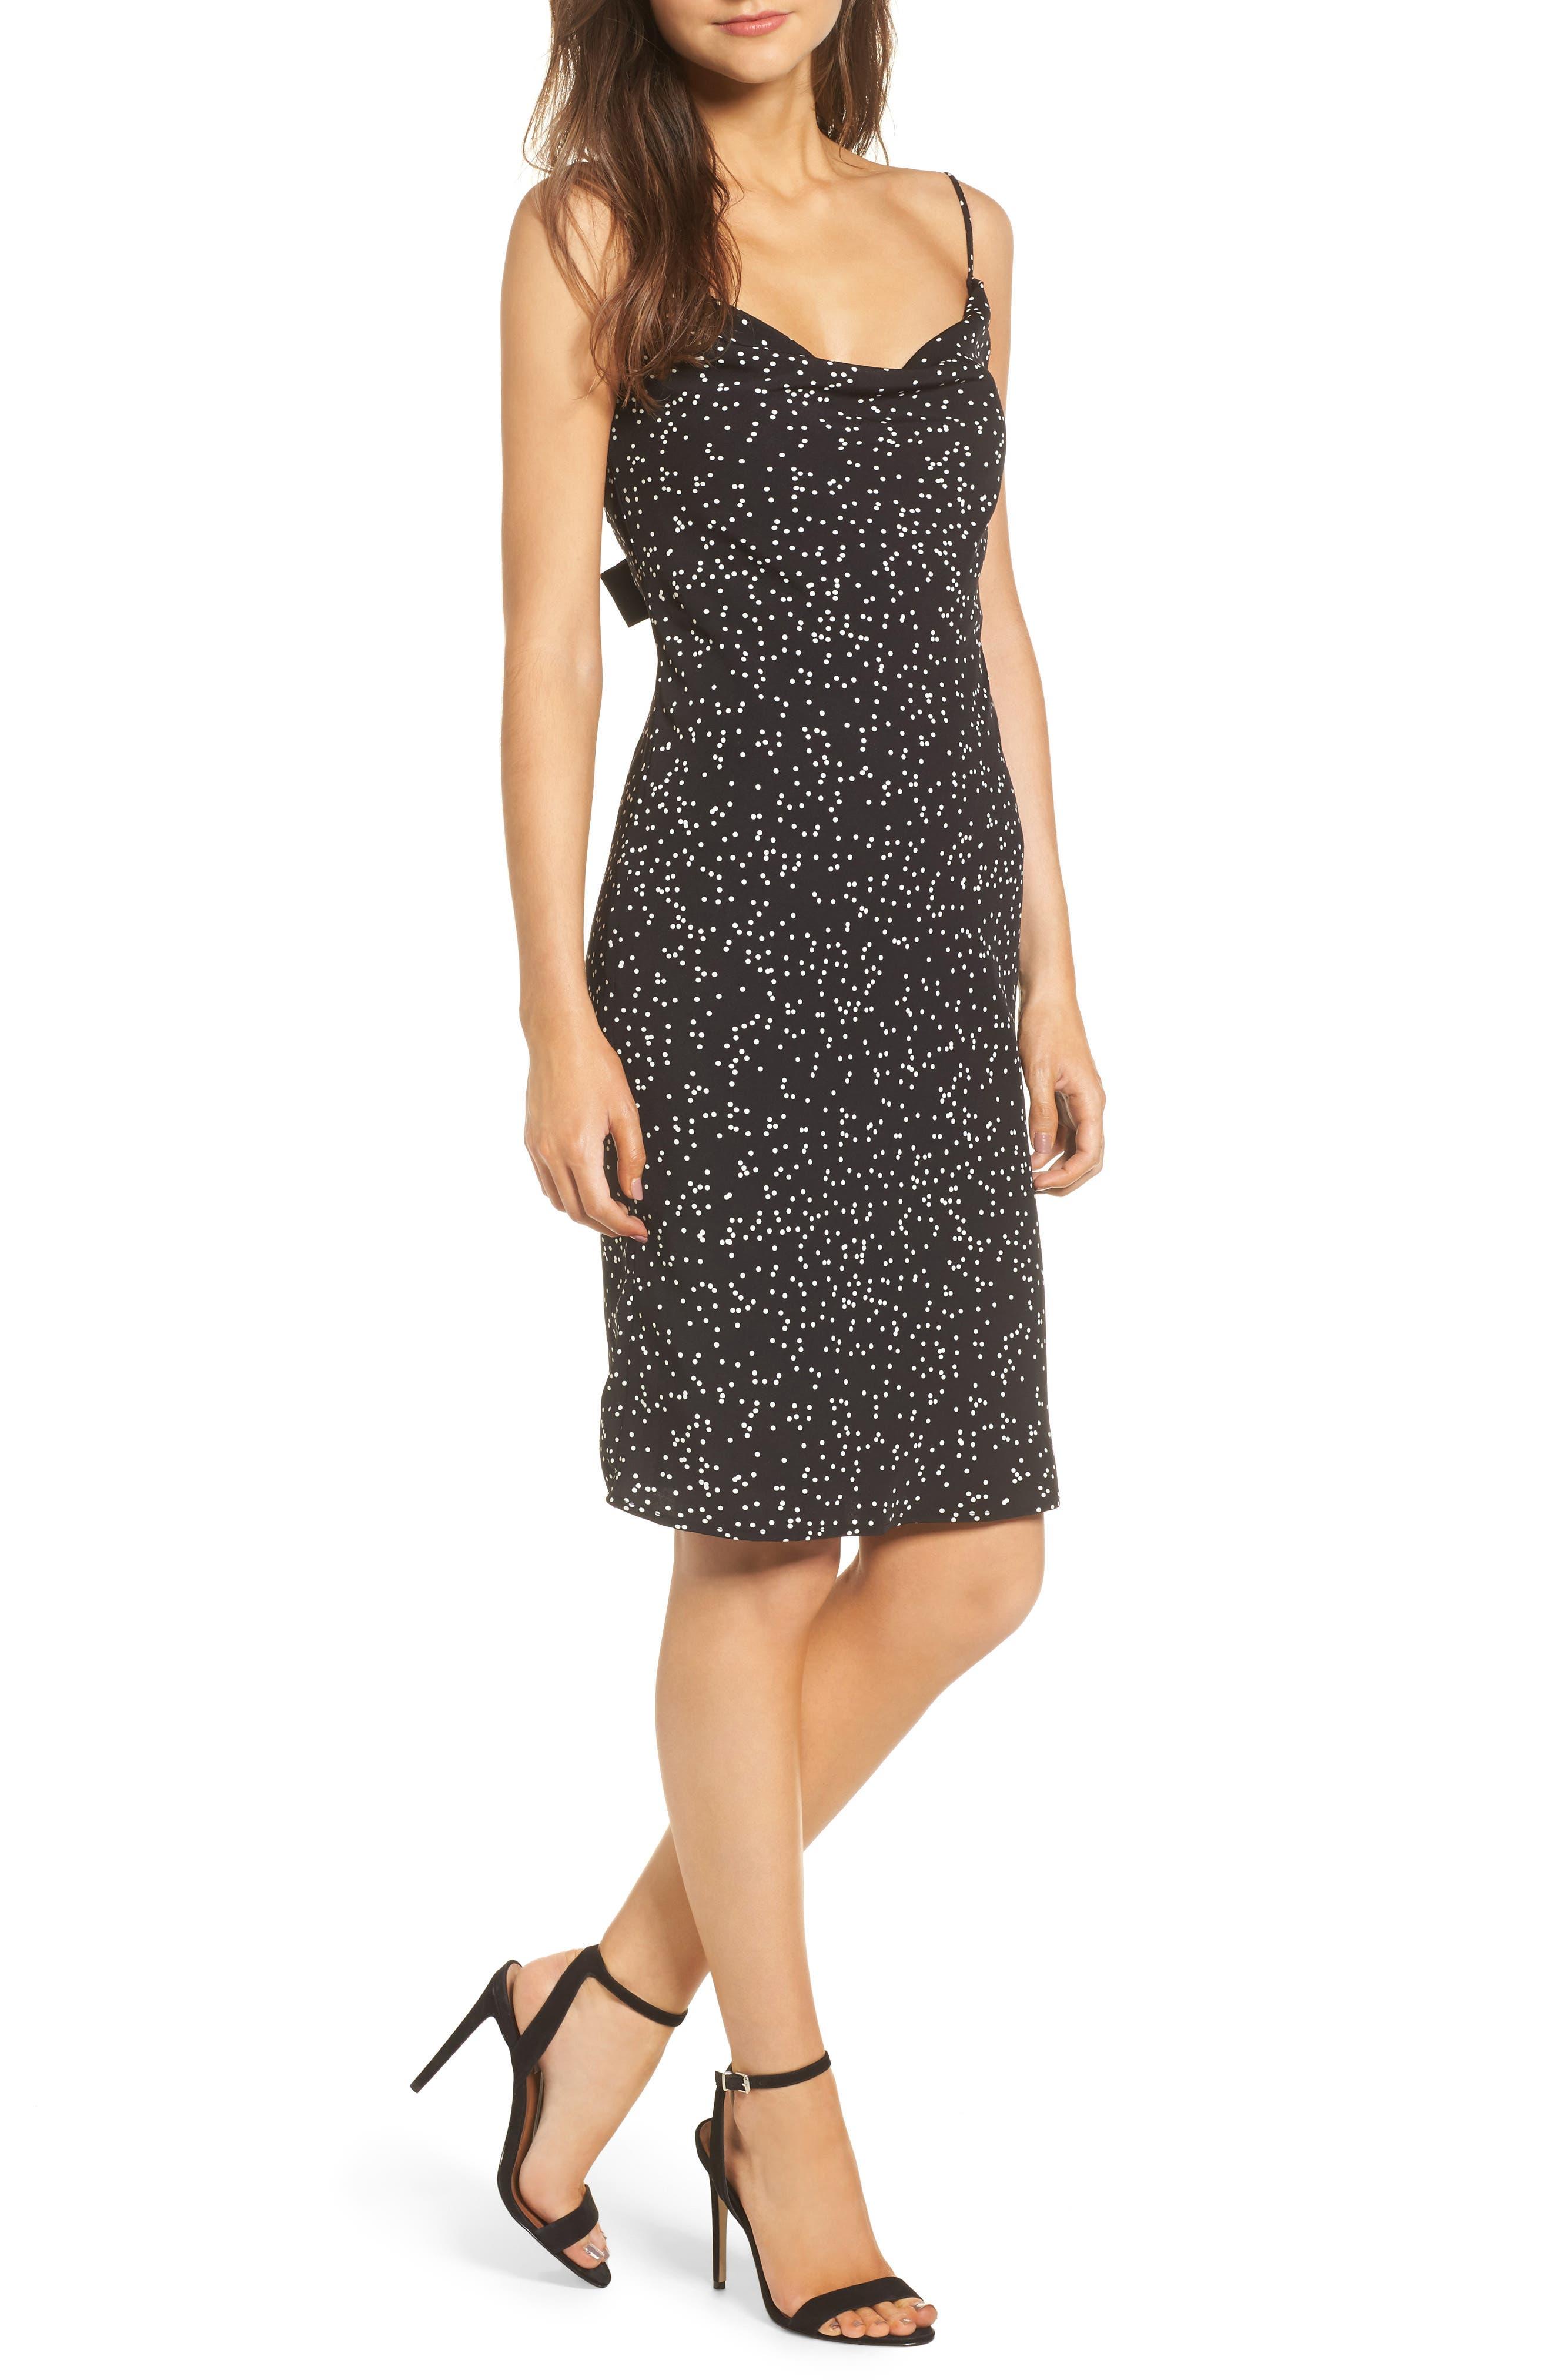 Embrace Me Tie Back Sheath Dress,                         Main,                         color, Black W White Spot